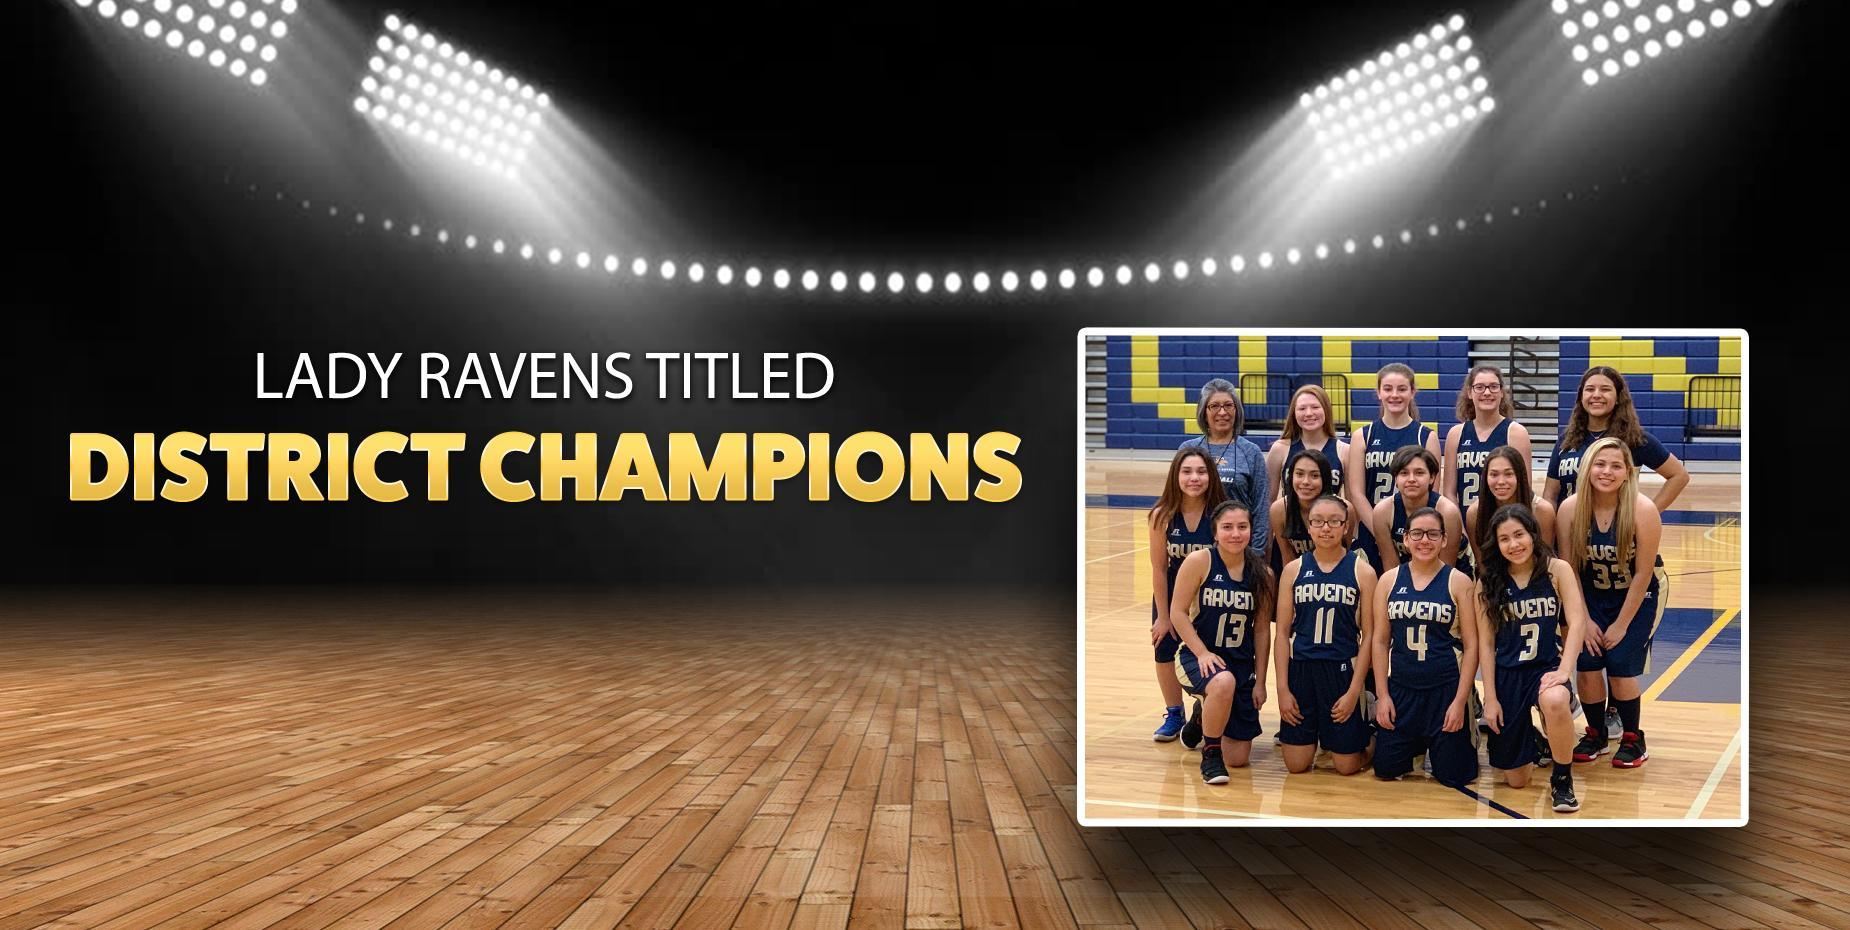 Lady Ravens District Champs